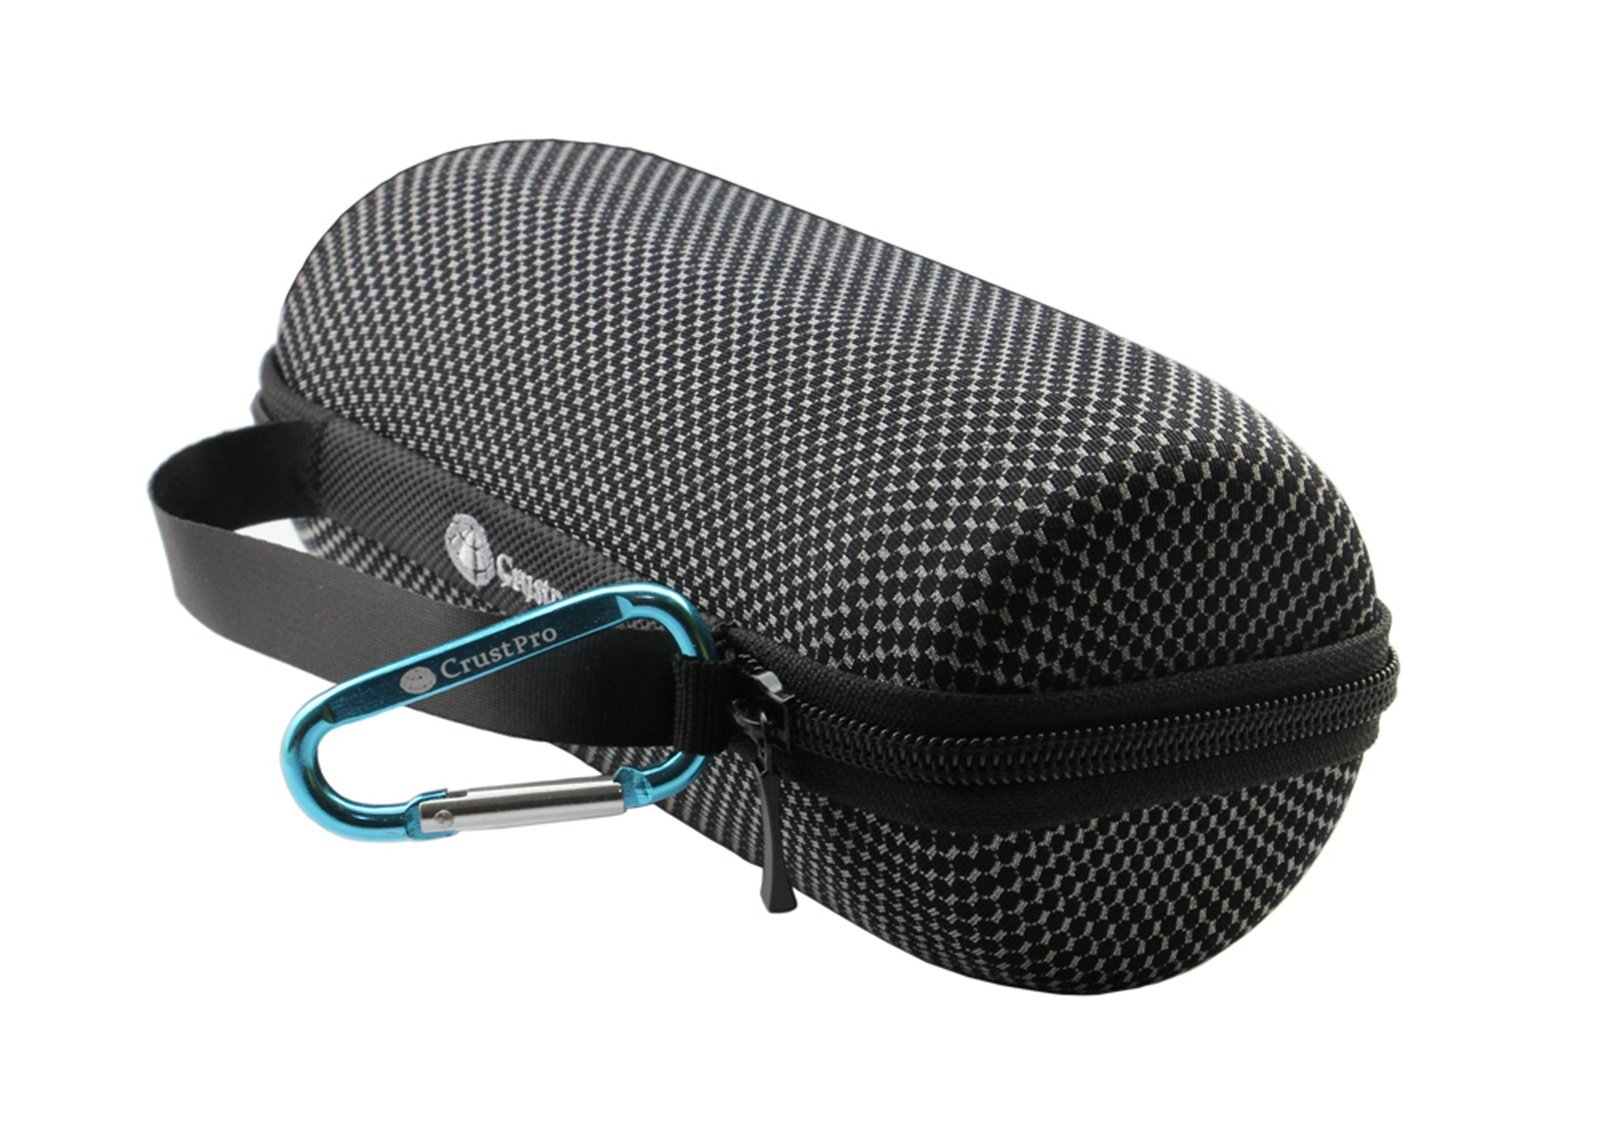 Xberstar Travel Carry Hard Case Bag for JBL Charge 2+ 2 Plus Splashproof Portable Bluetooth Speaker & JBL Charge 2 JBL Pulse Bluetooth Speaker